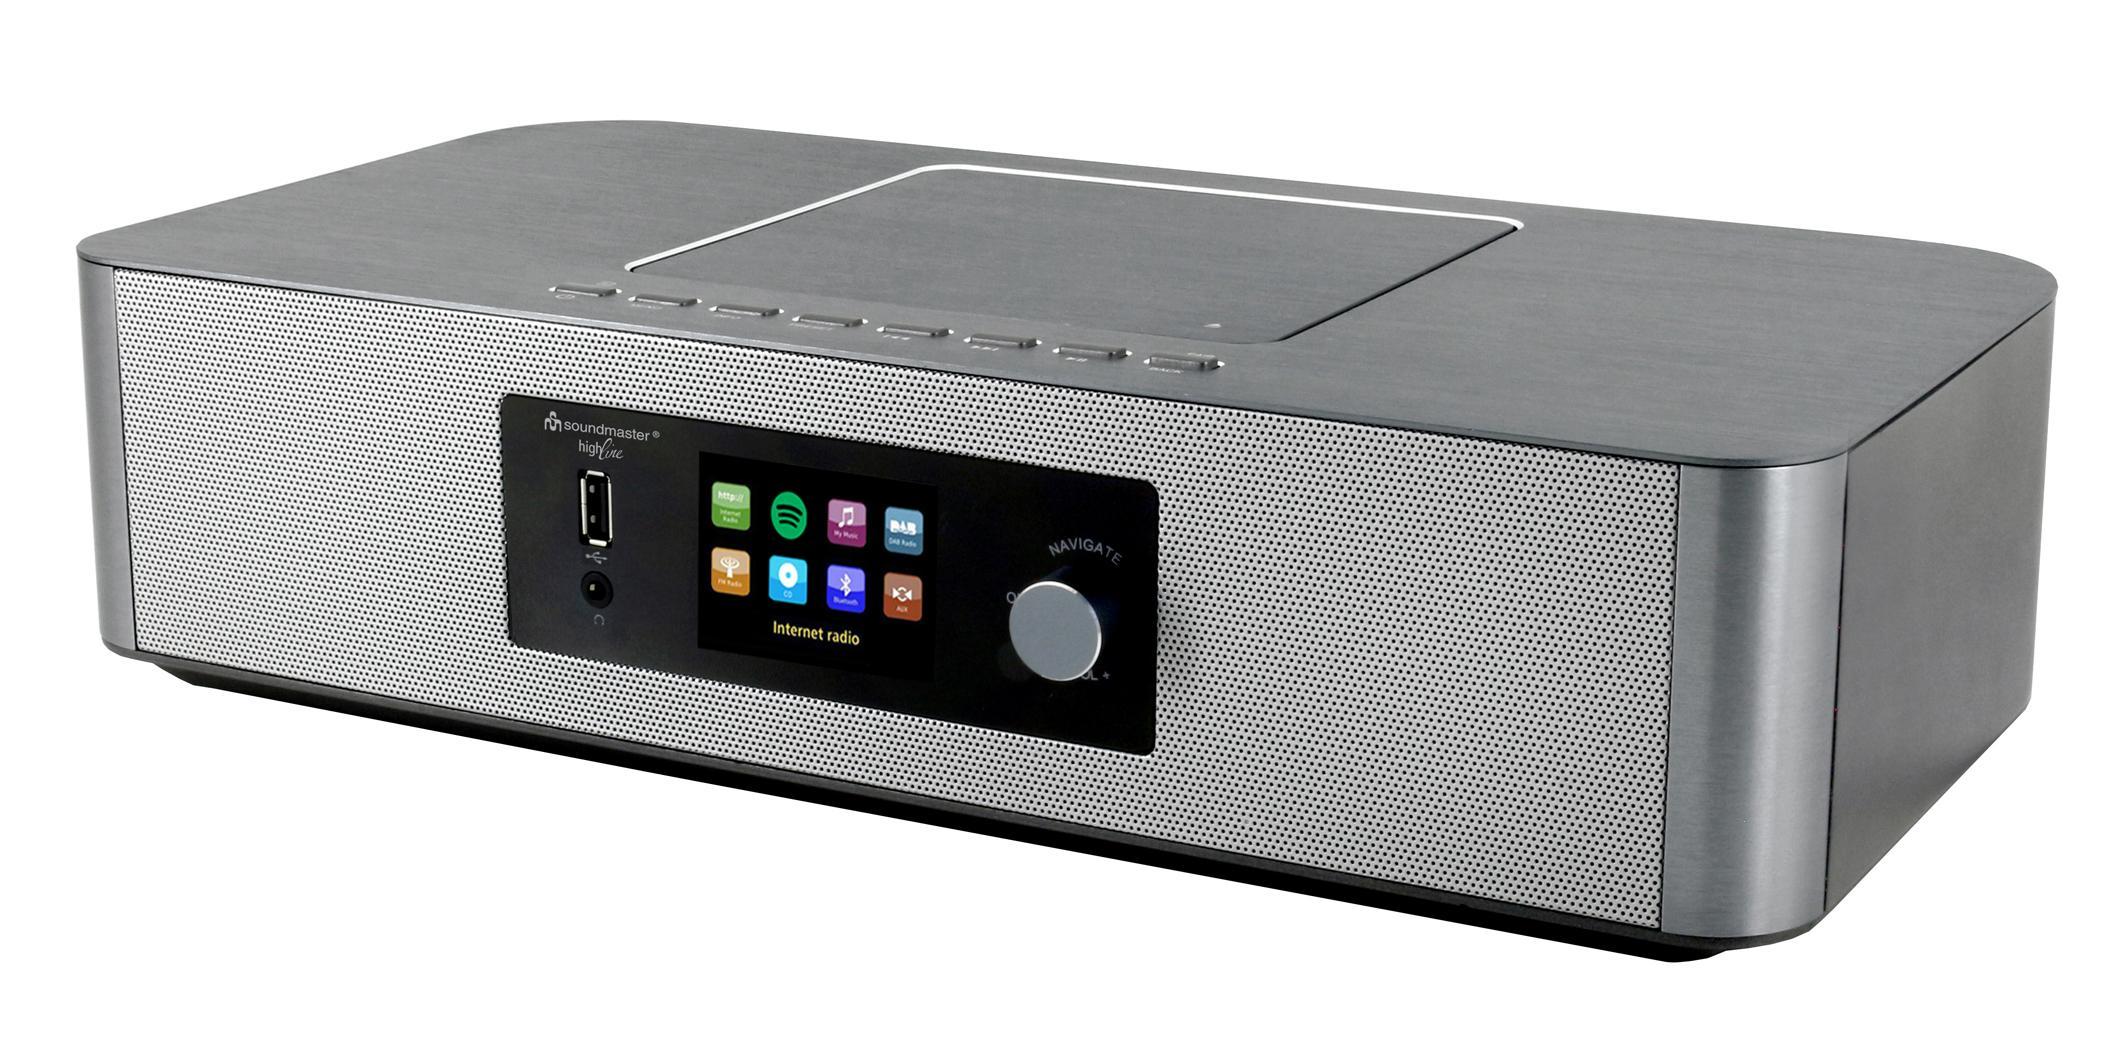 Buy Soundmaster Icd2020 Spotify Bluetooth Cd Player